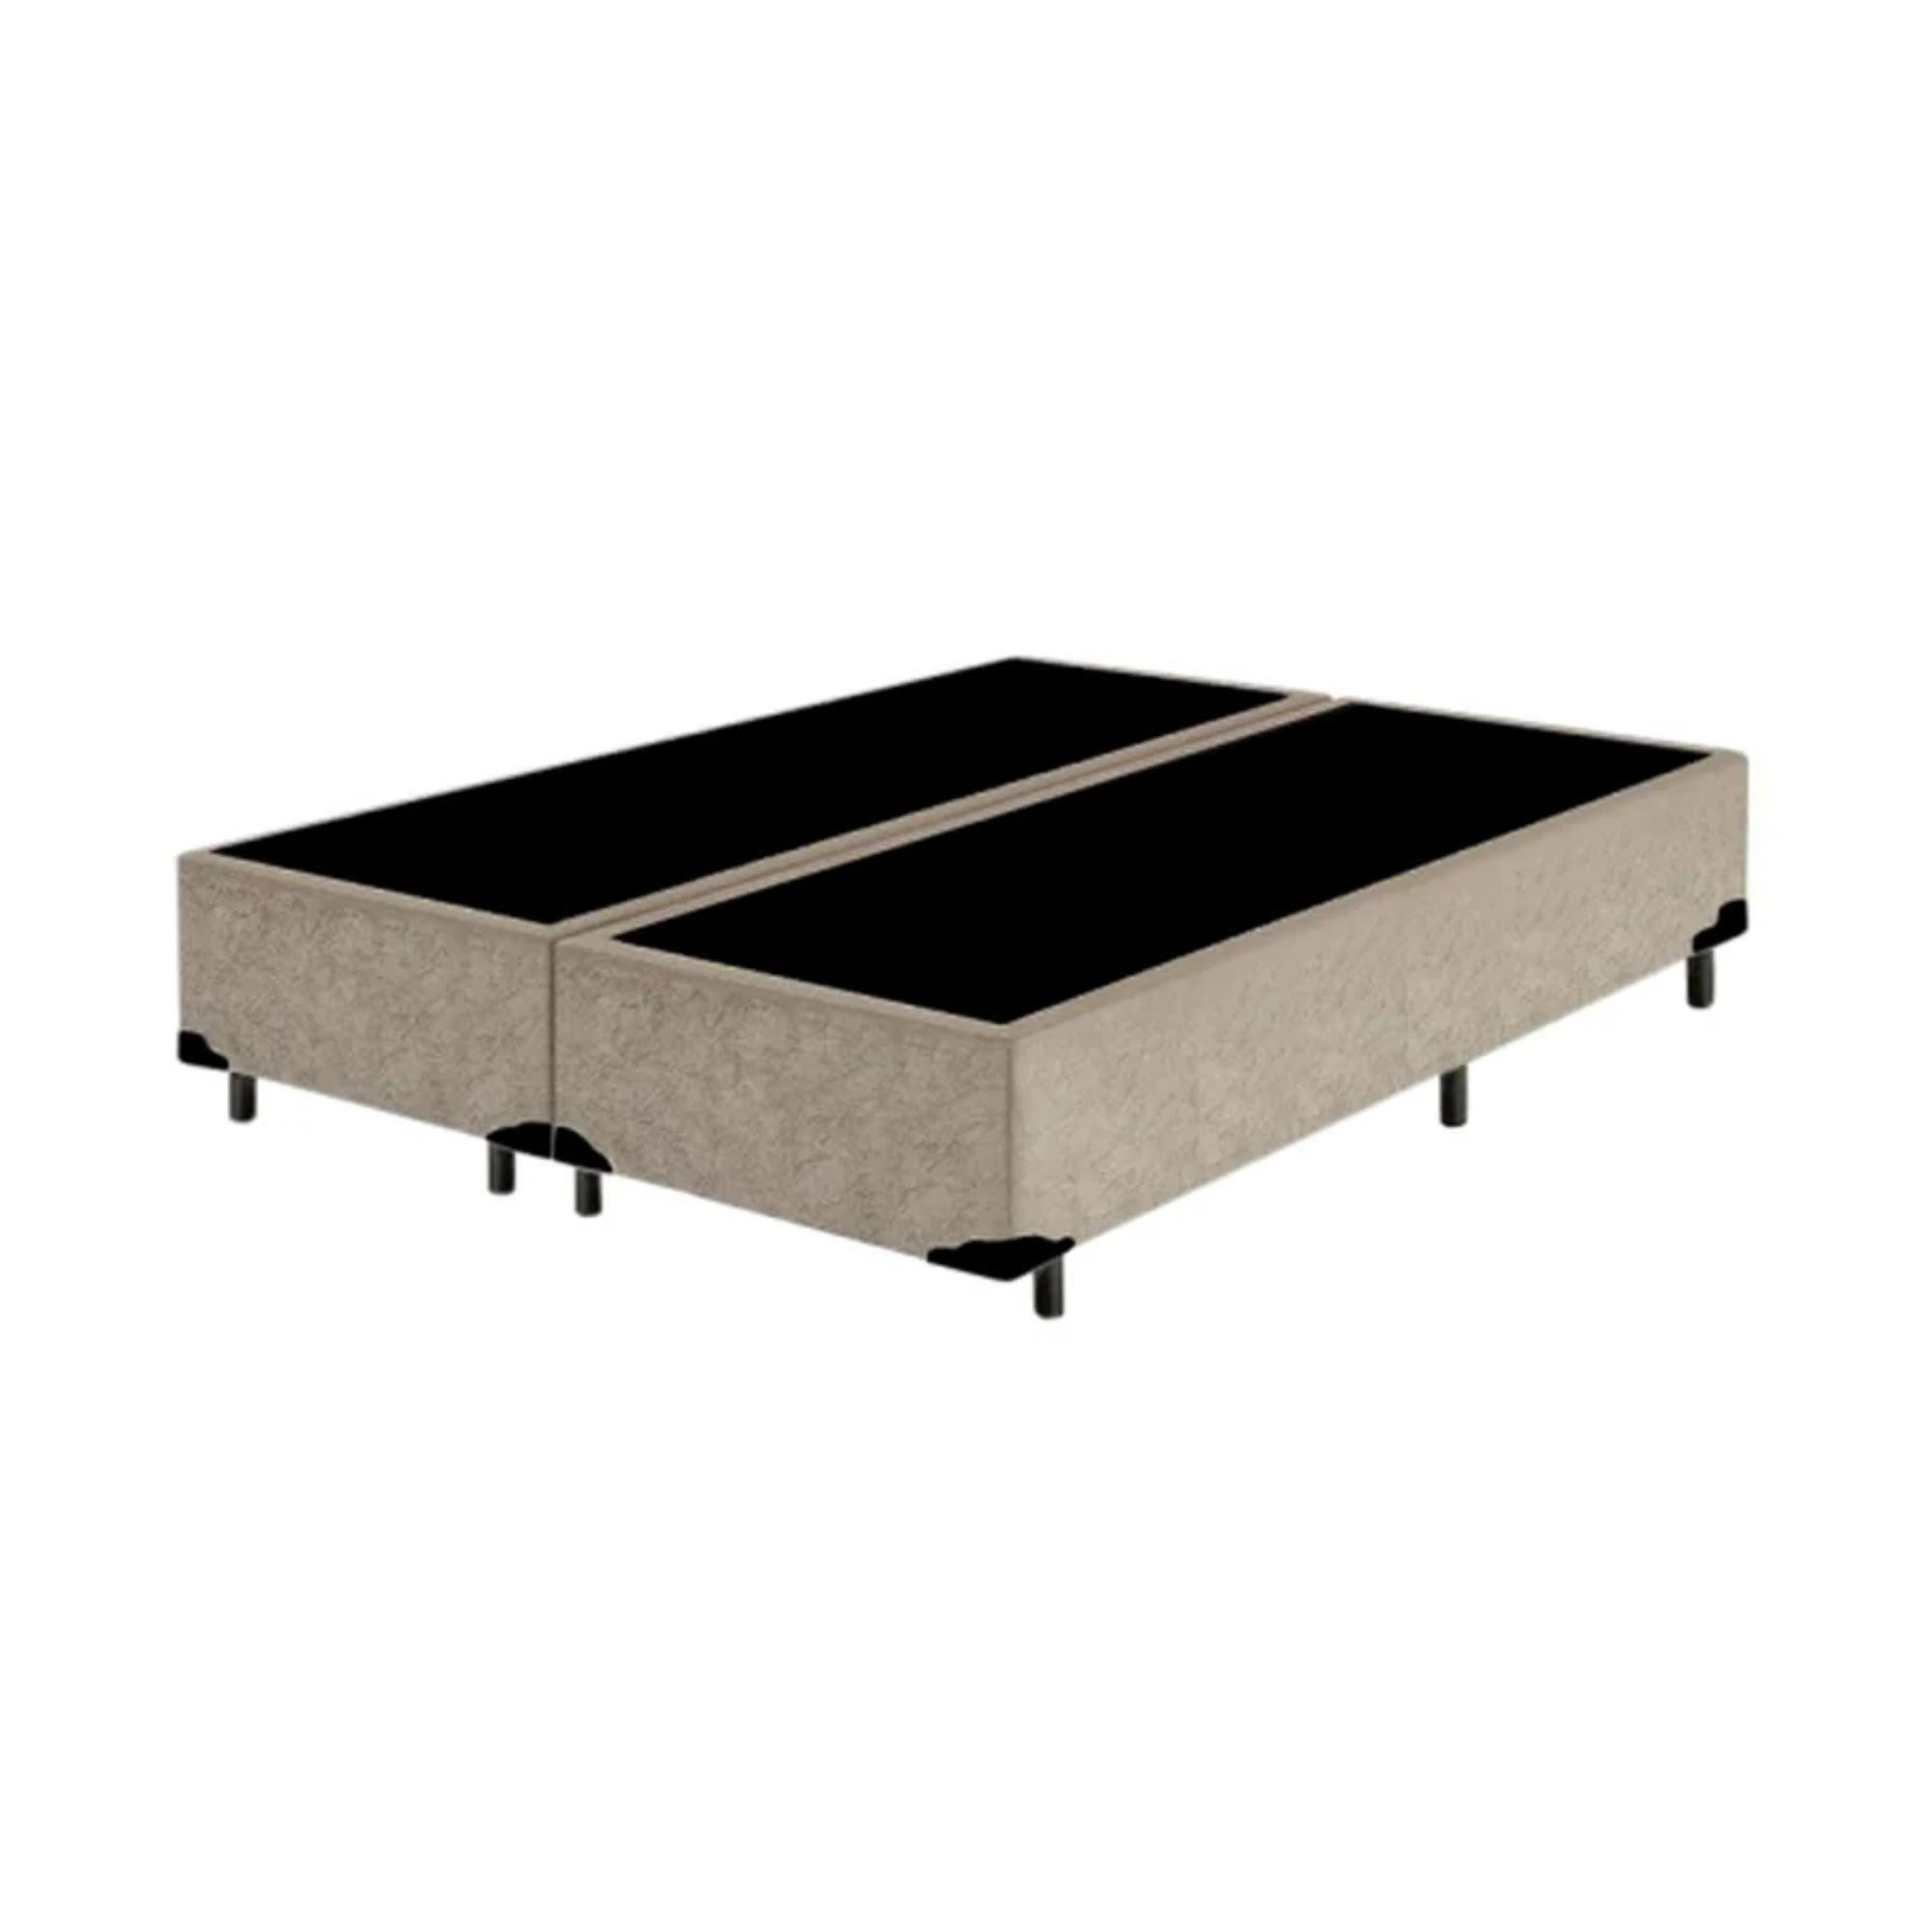 Cama Box Bipartida Suede King (193x203) - Starmoon